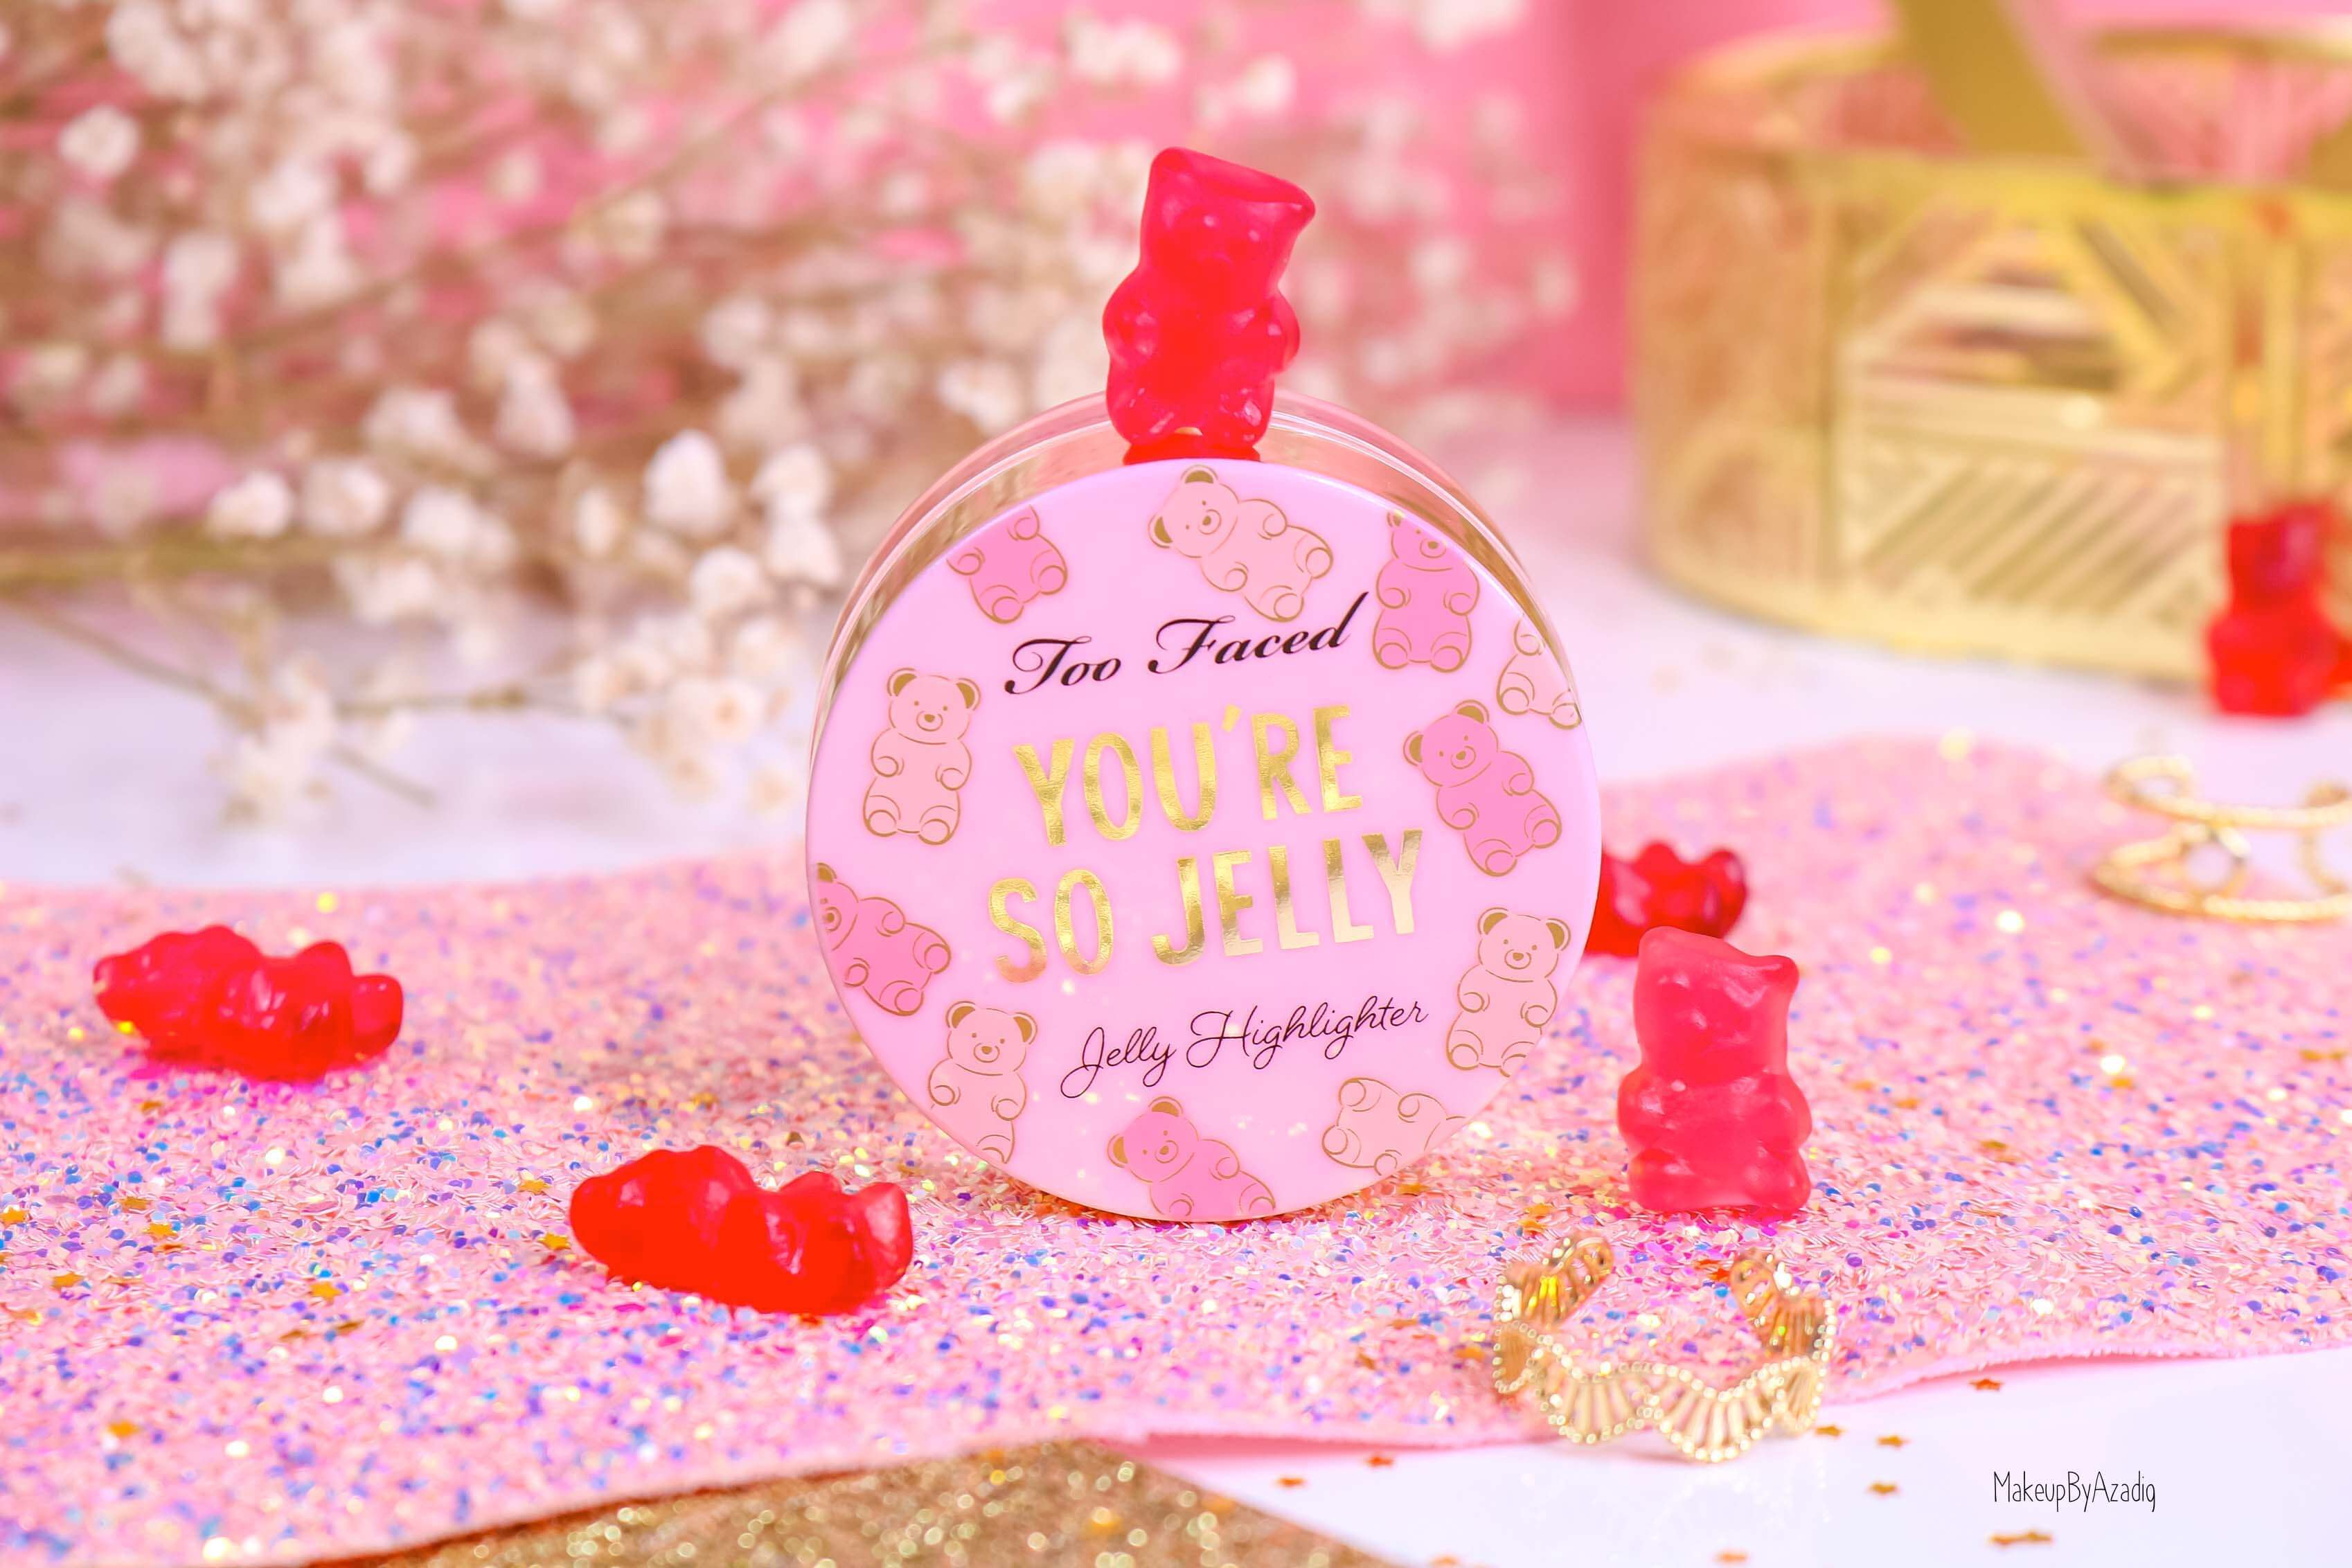 revue-highlighter-jelly-gel-rose-pink-too-faced-texture-cute-avis-prix-swatch-makeupbyazadig-sephora-france-packaging